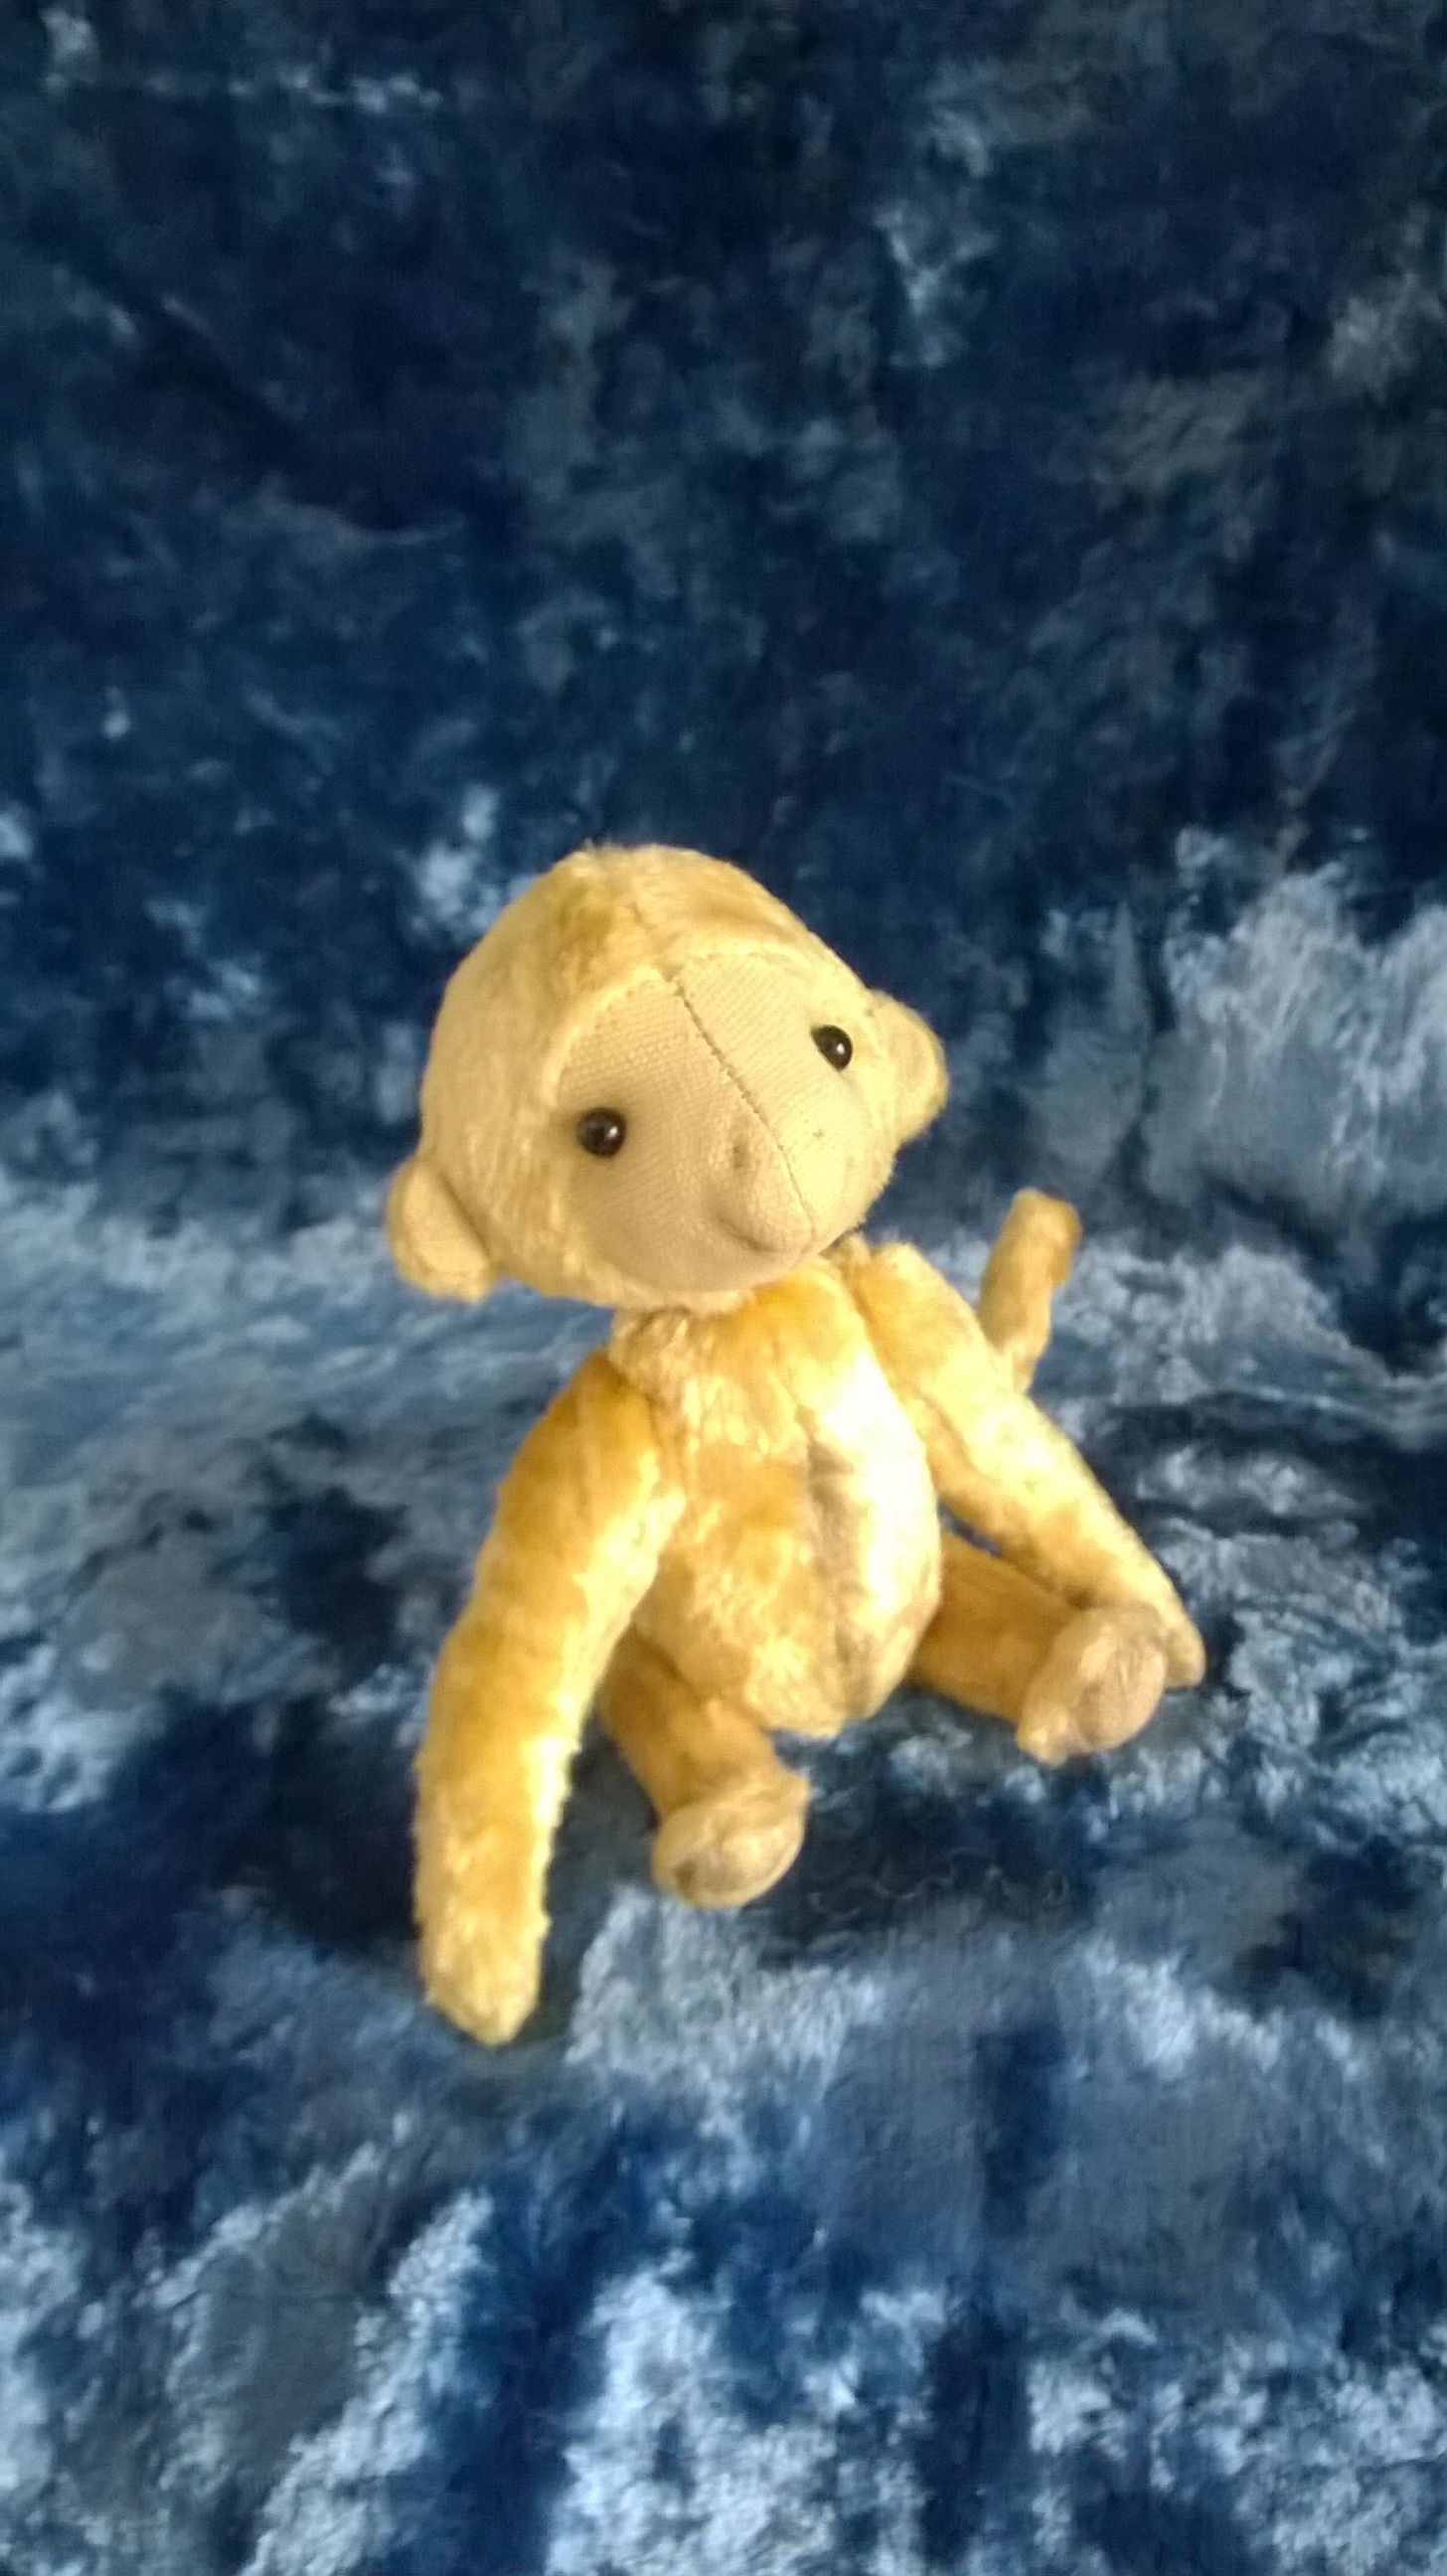 обезьяна подарок символгода тедди друзьятедди другтедди авторскаяигрушка